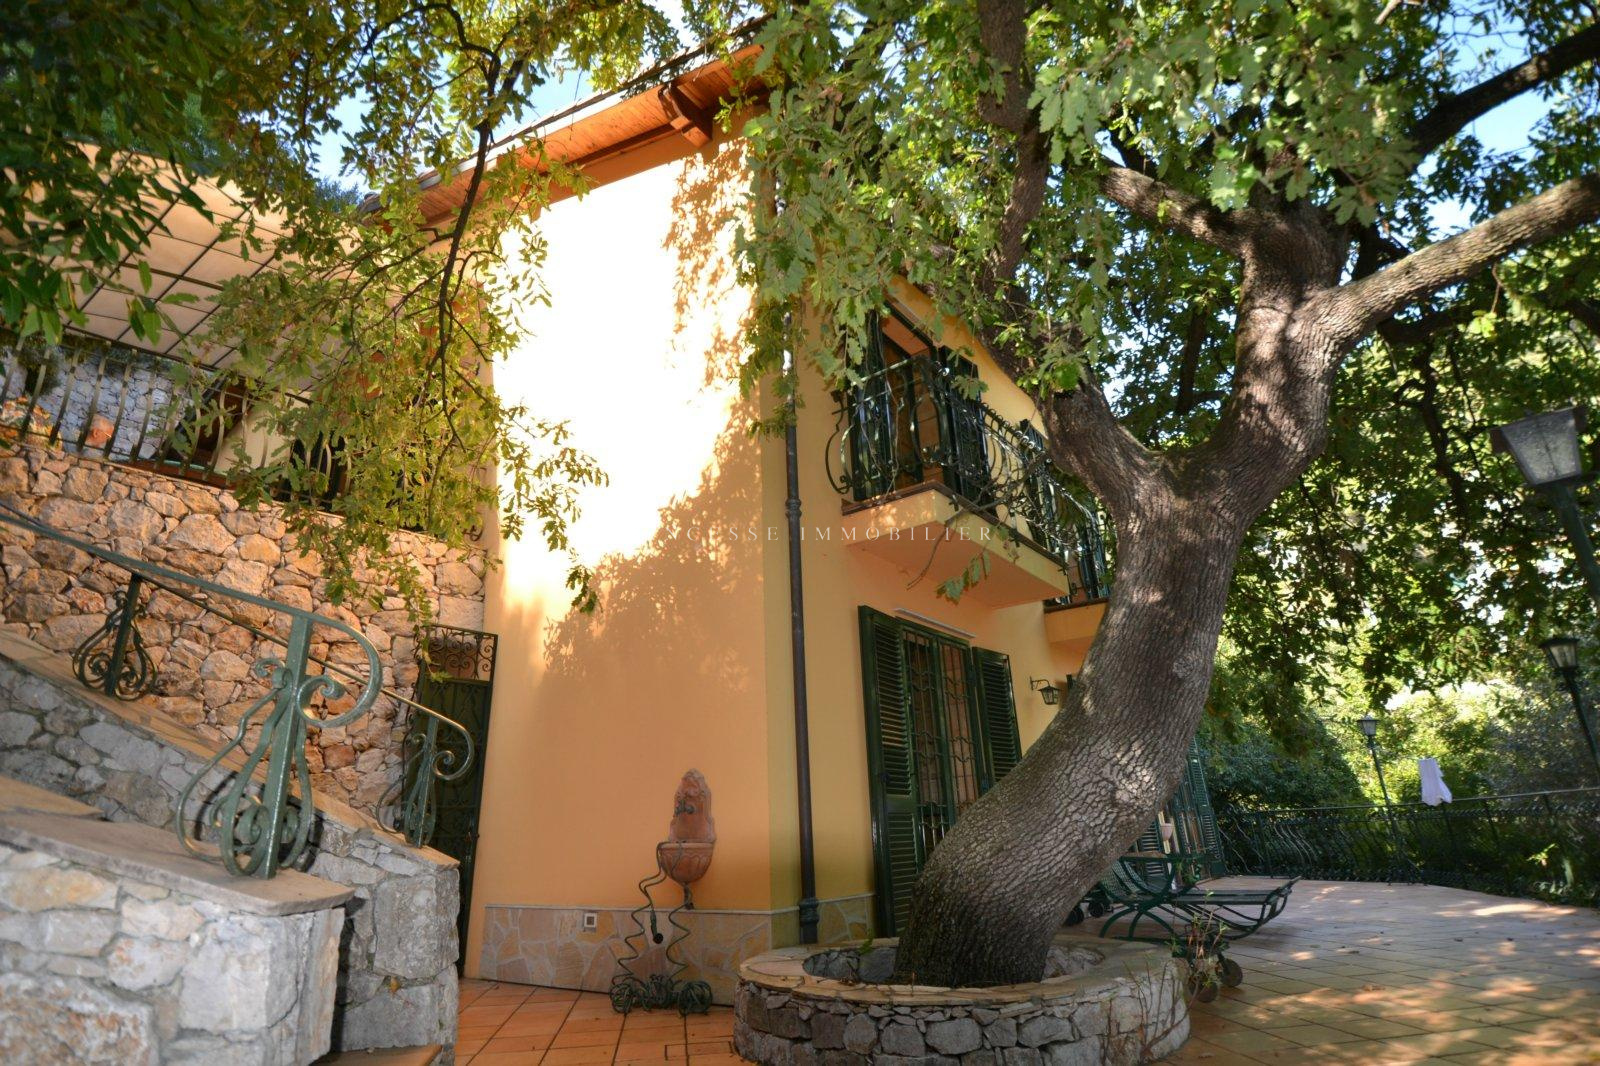 Vente villa roquebrune cap martin avec princesse immobilier for Acheter maison menton